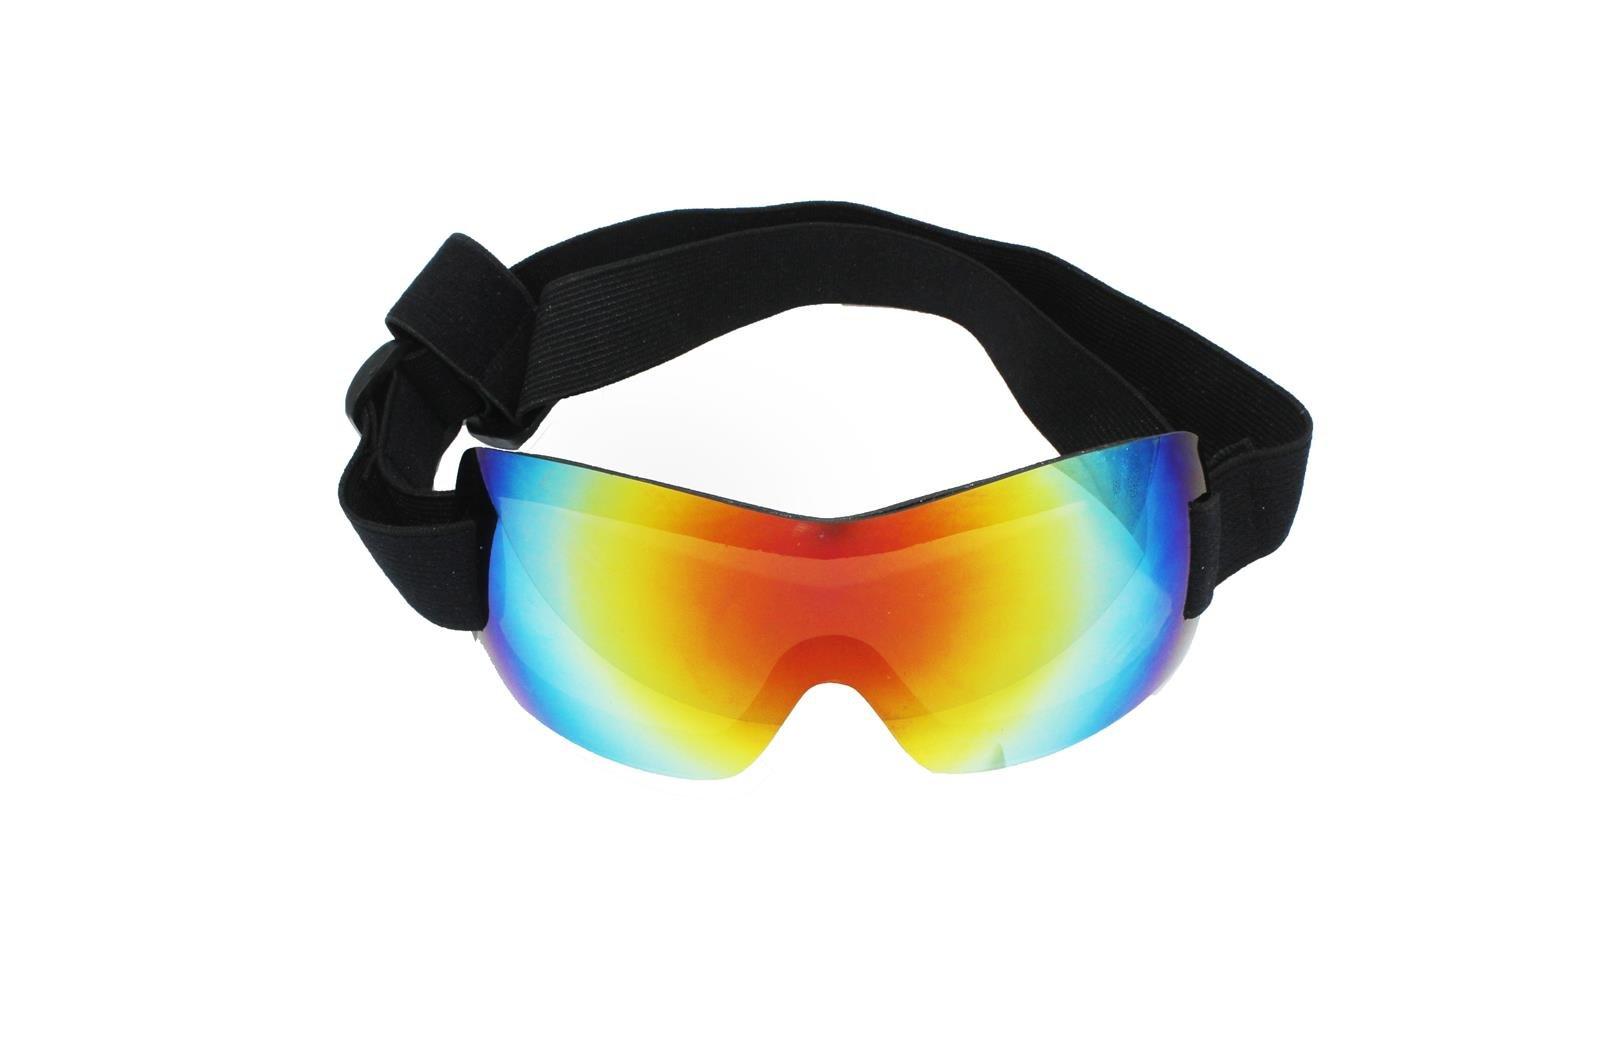 da5de980654a Get Quotations · Dog Sunglasses Ski Goggles - PetRich Eye Wear UV Protection